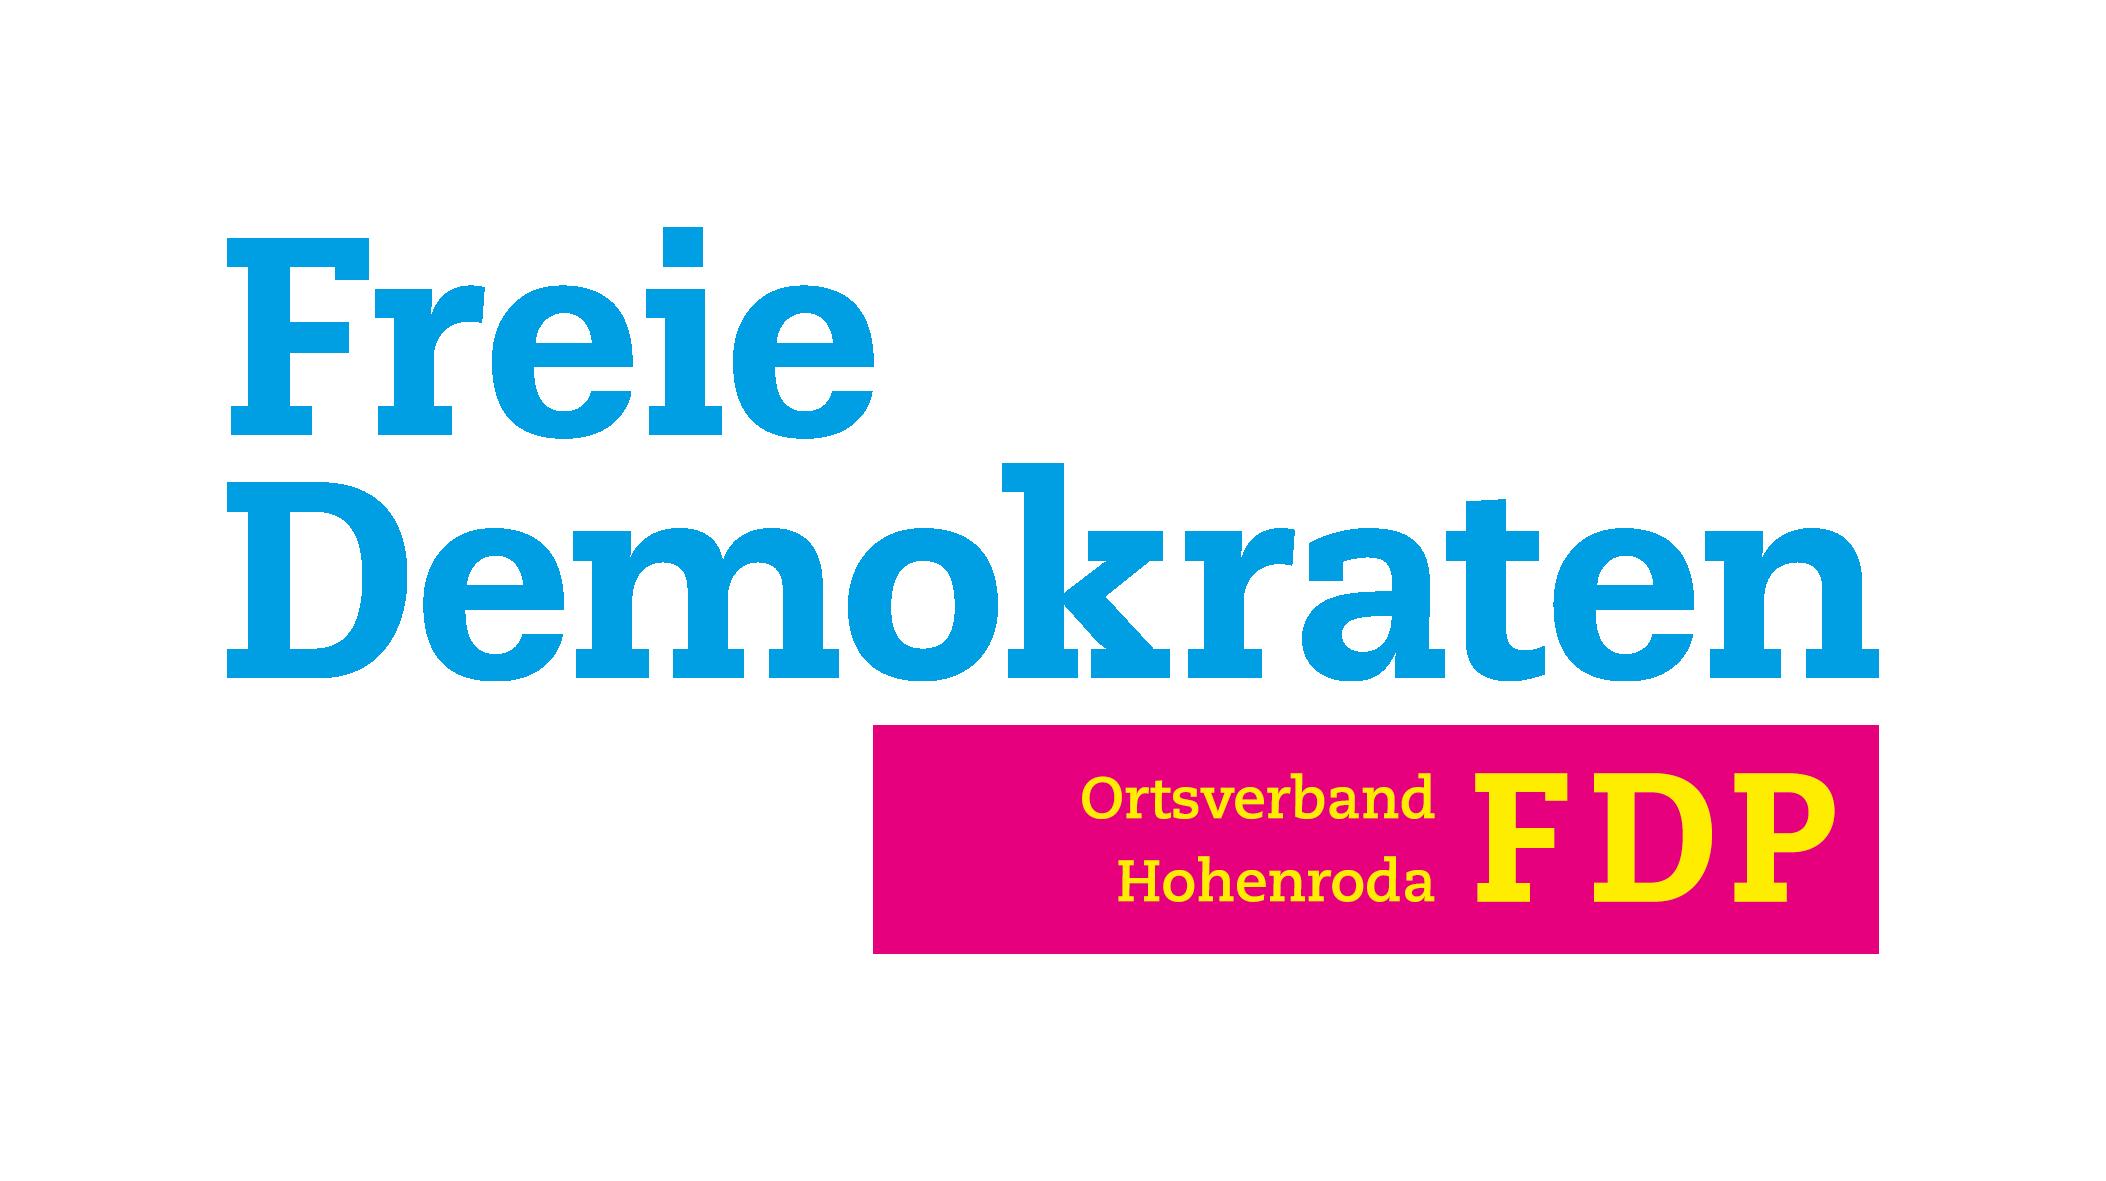 Hohenroda